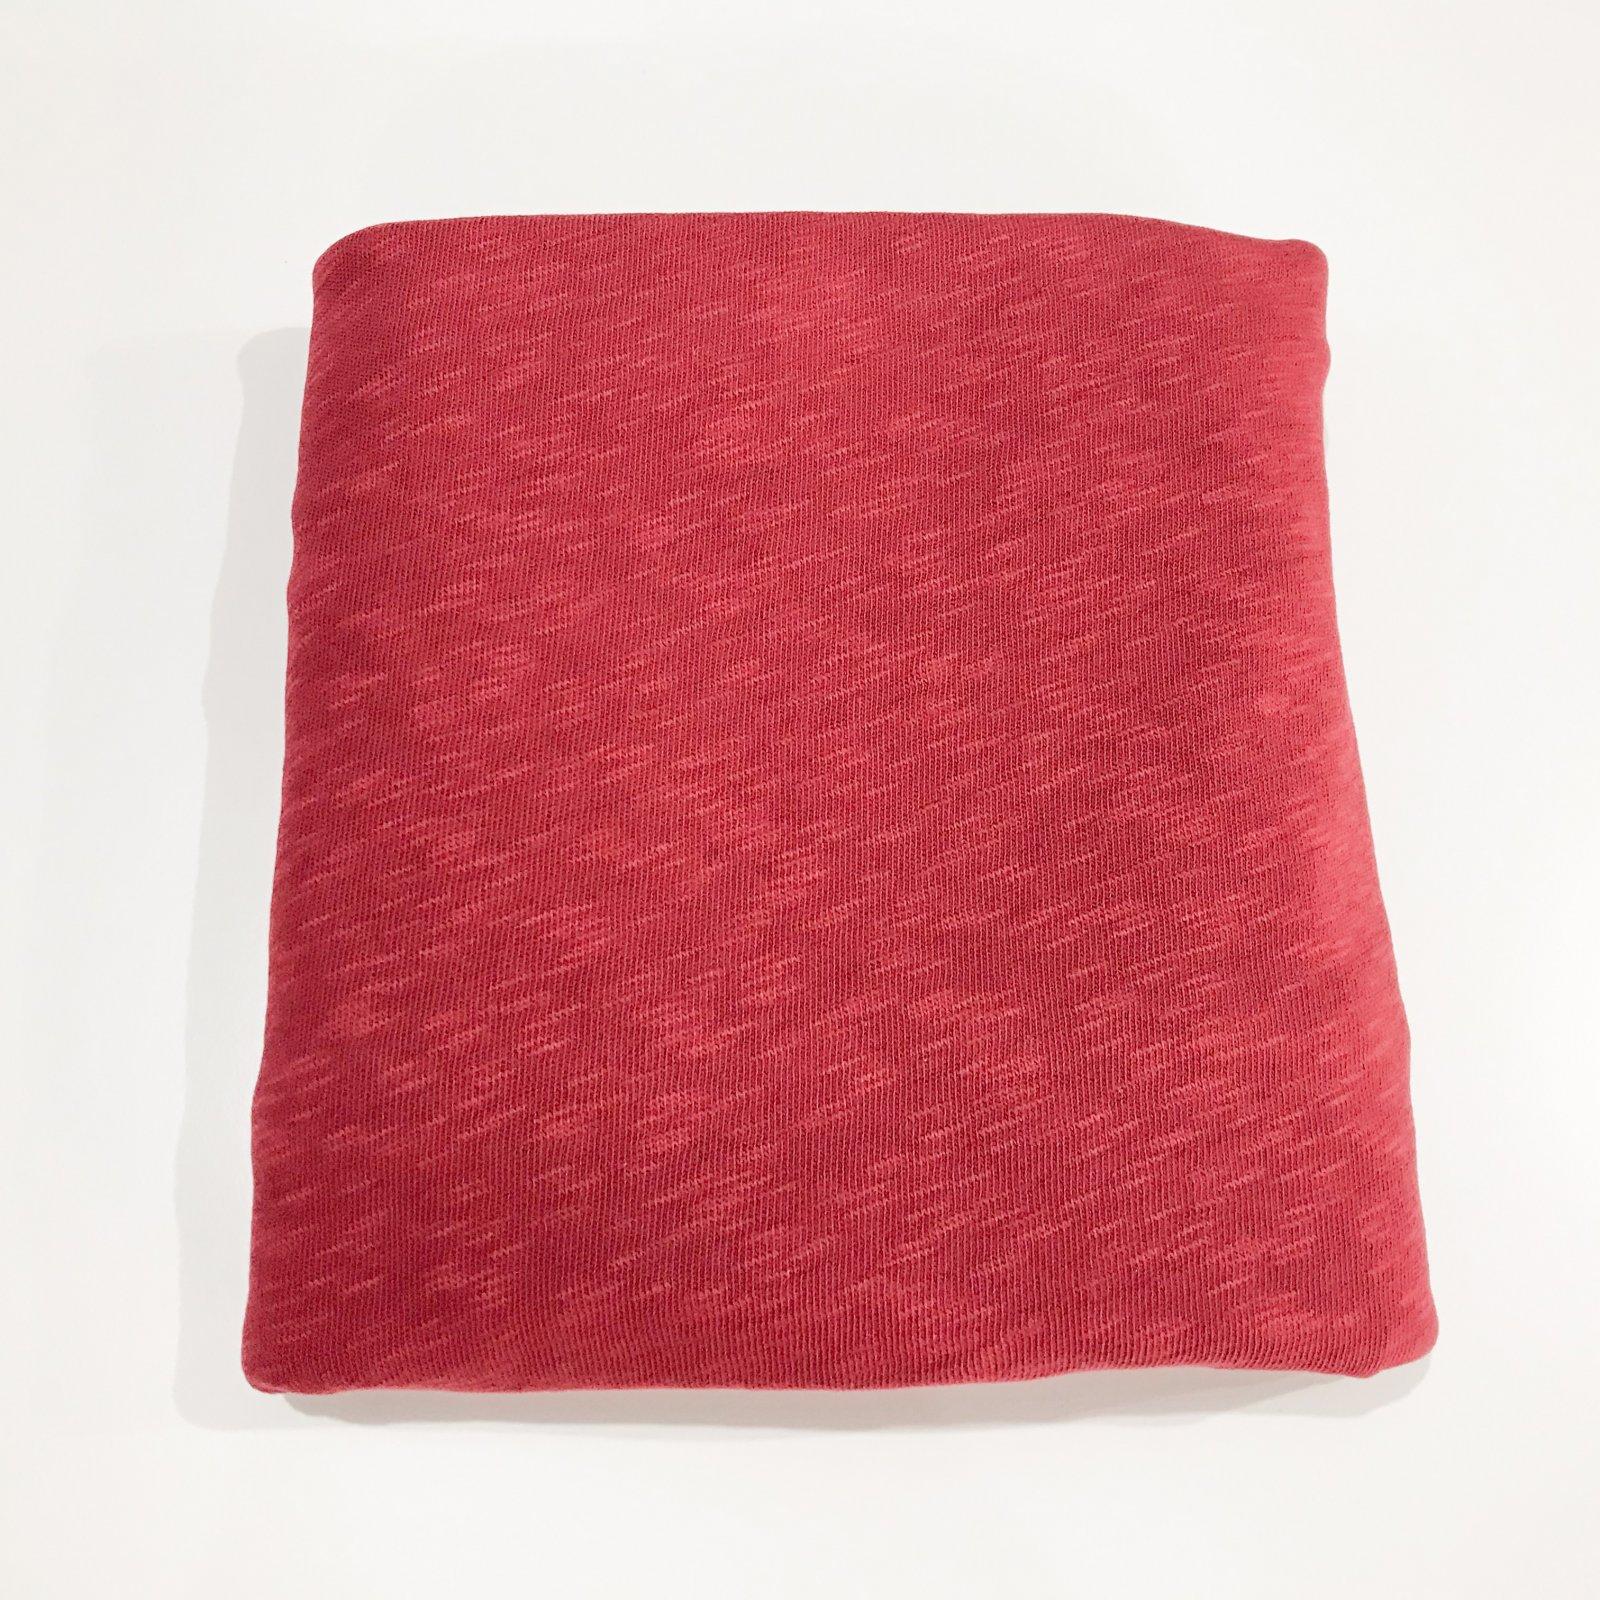 1 3/4 yard - Cotton Sweater Slub Knit - Crimson